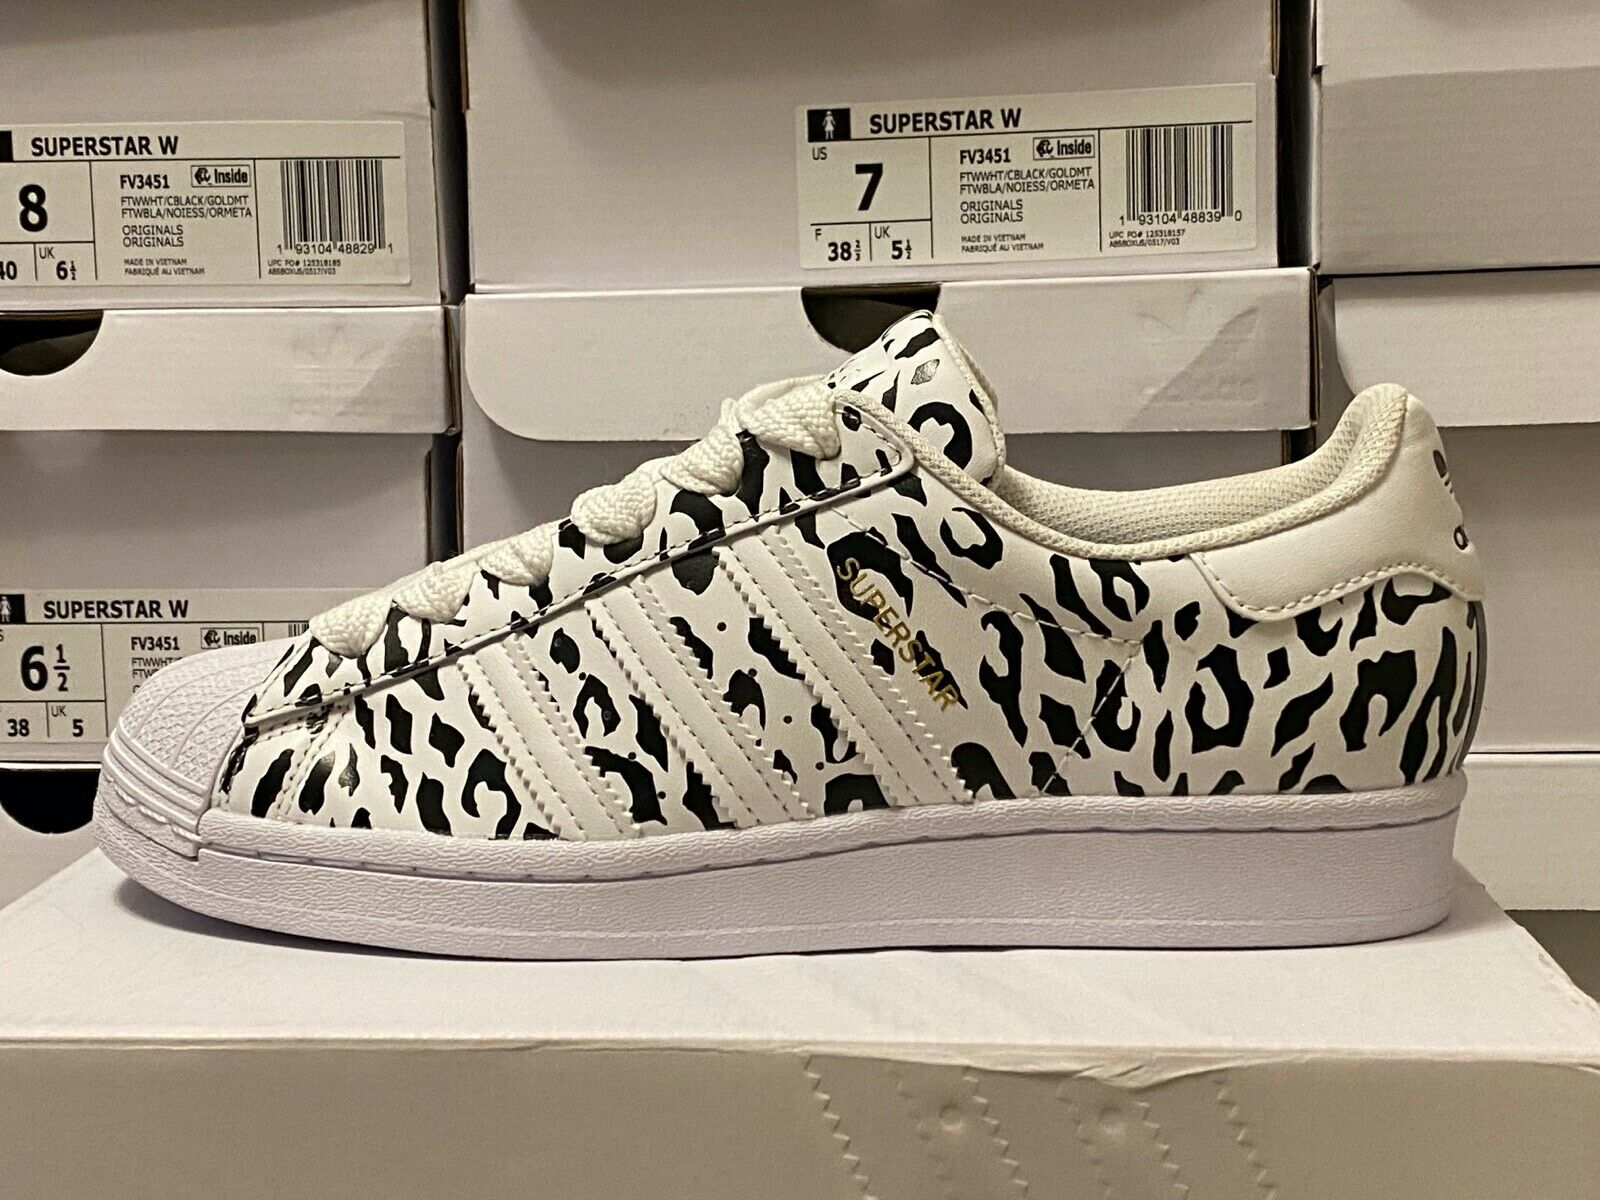 Size 6.5 - adidas Superstar Cheetah Print 2020 for sale online | eBay